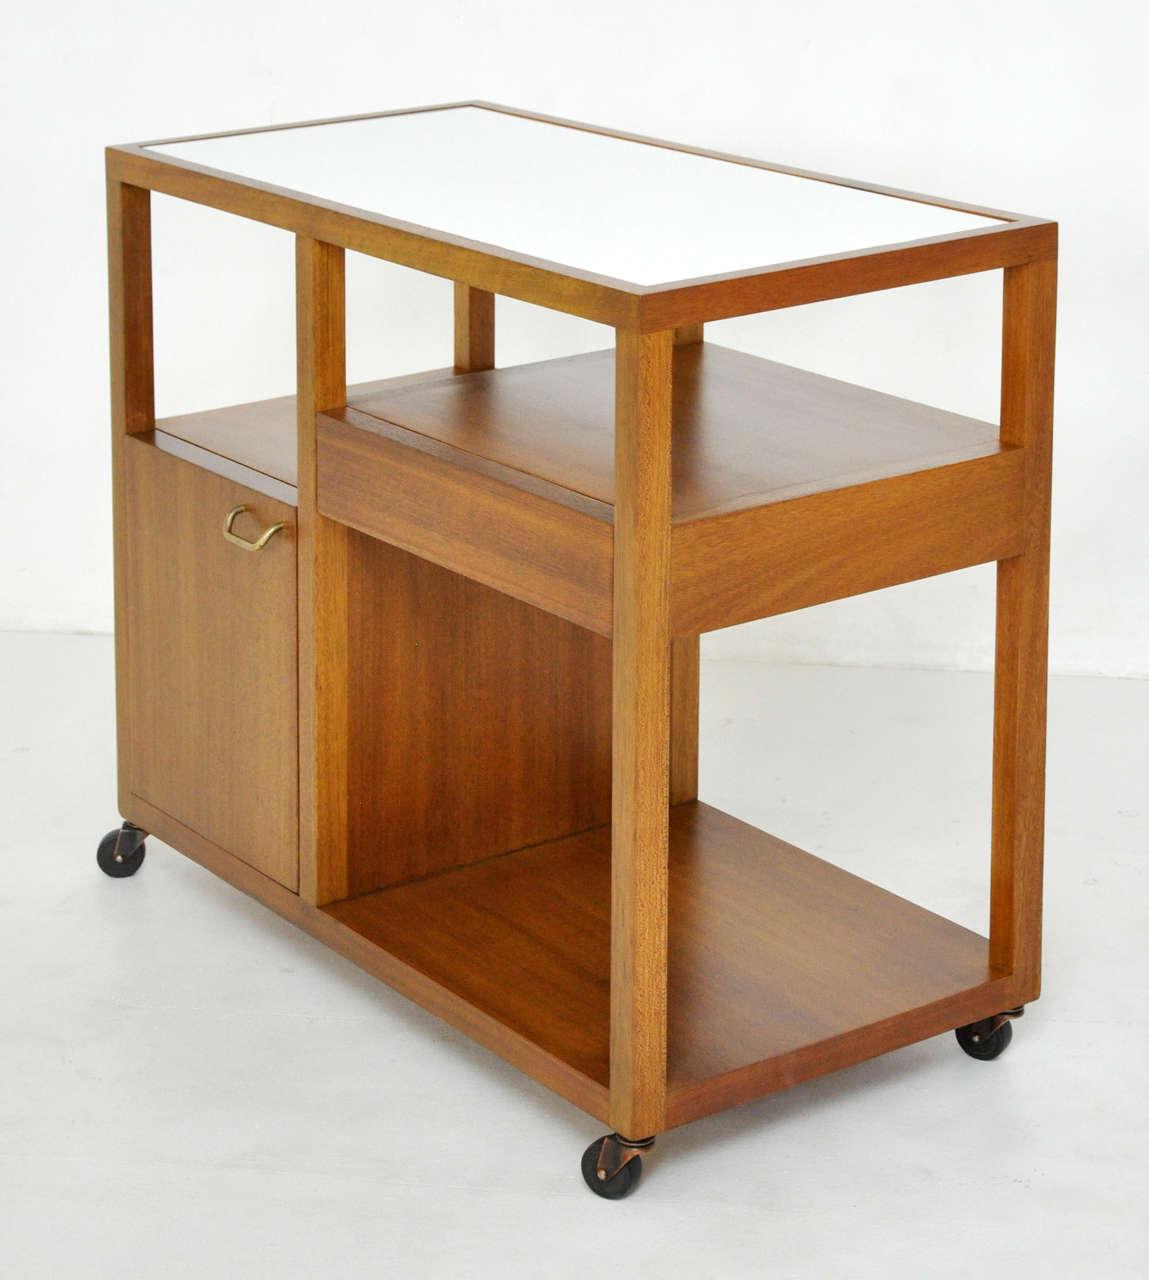 Server trolley designed by Harvey Probber. Fully restored mahogany case with white vitrolite glass top.